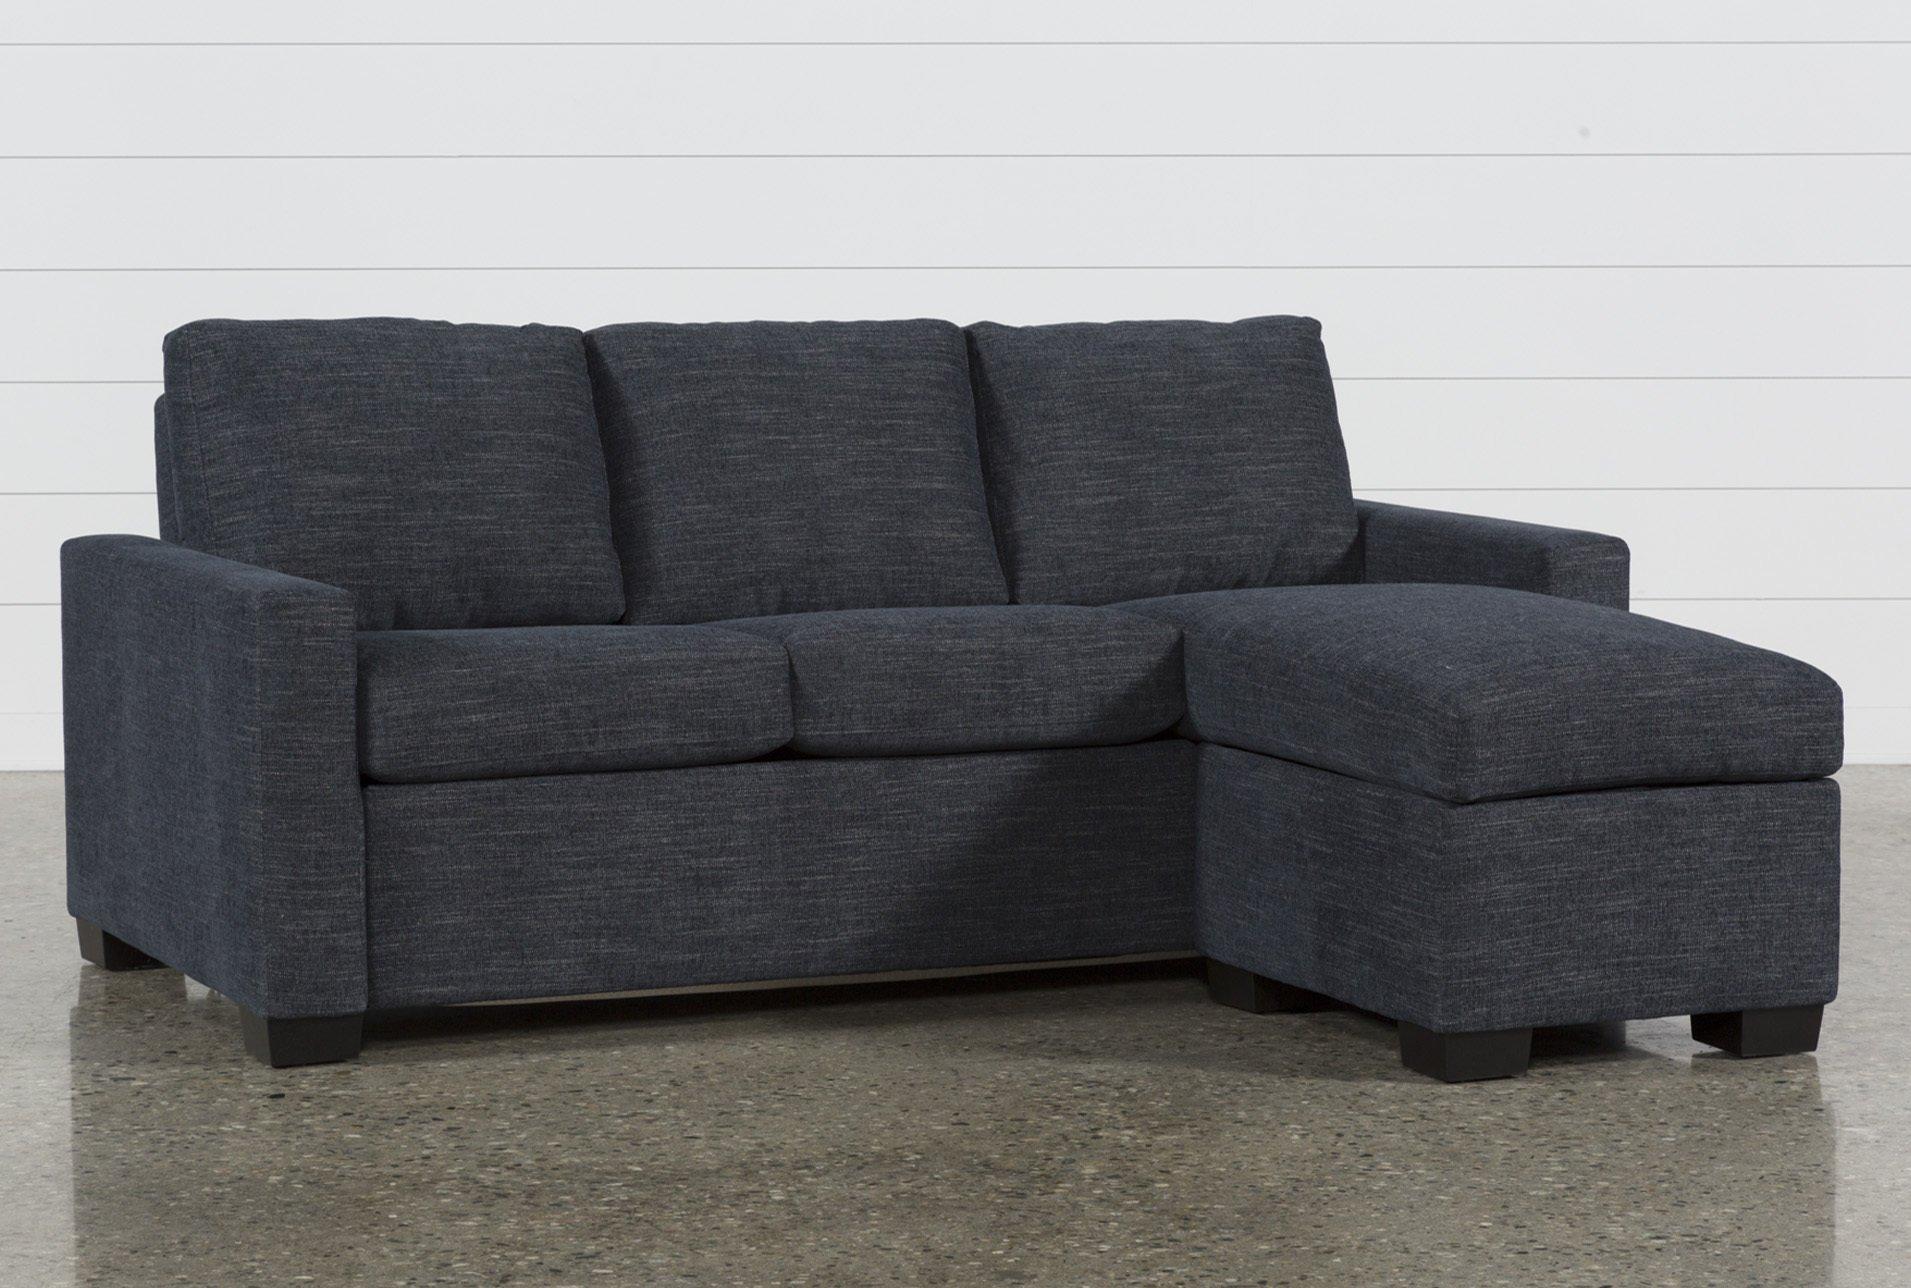 Mackenzie Denim Queen Plus Sofa Sleeper W/ Storage Chaise | Living